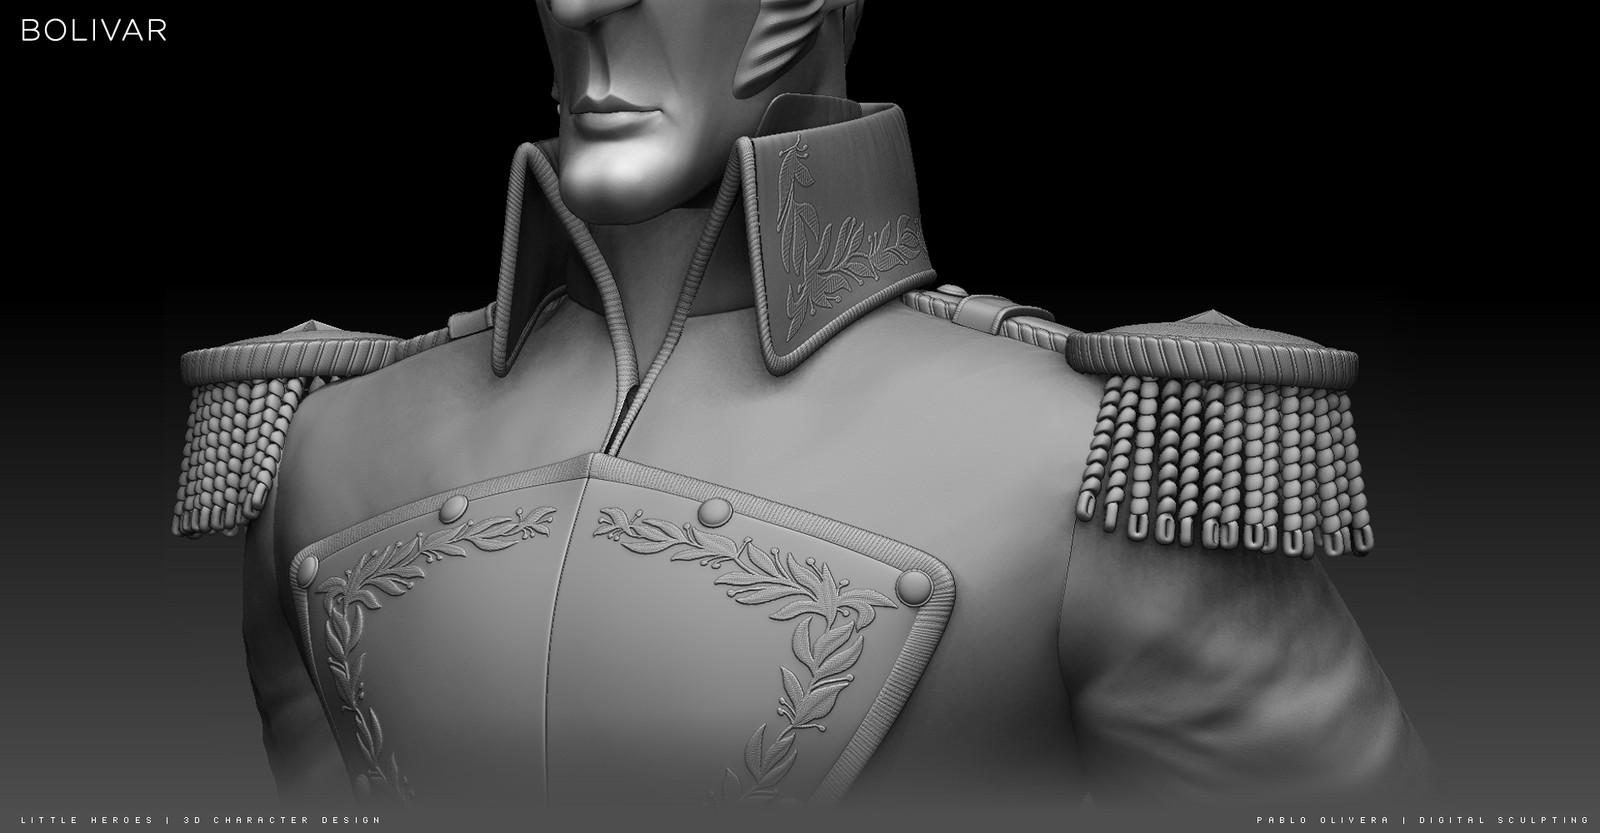 Bolivar ( 3d character modeling / sculpting )